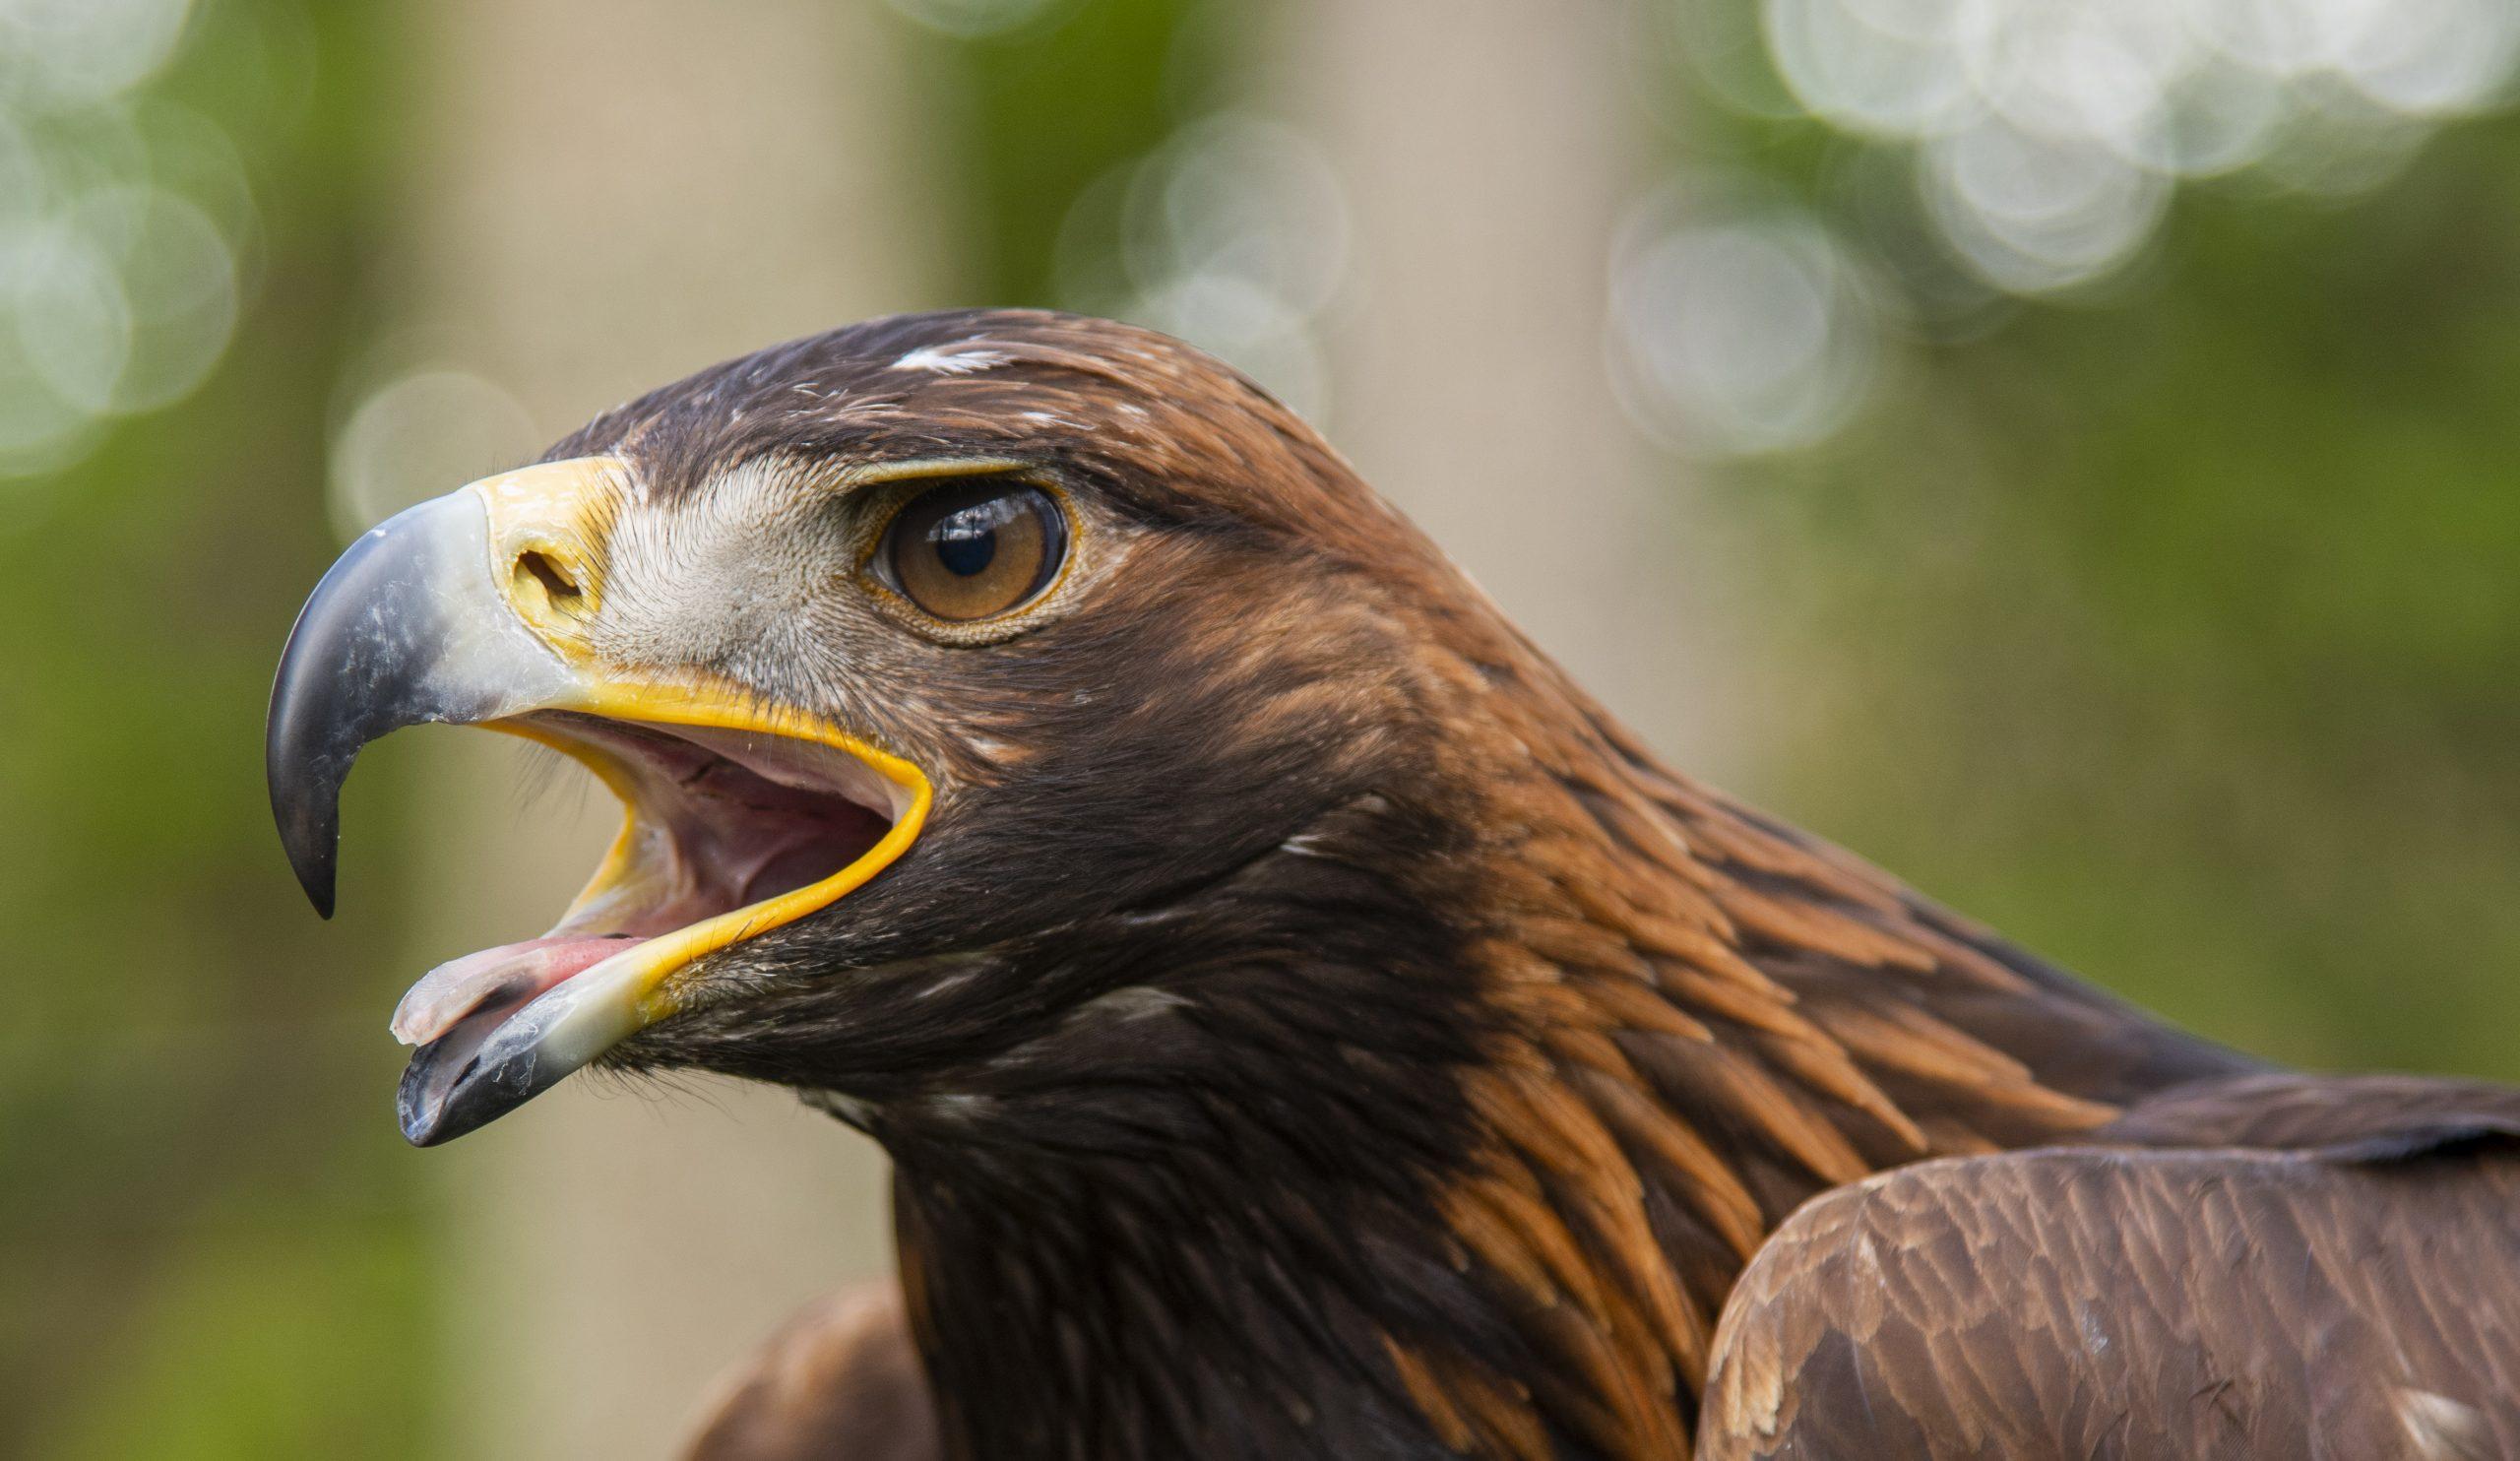 Plans revealed  for autumn  eagle festival